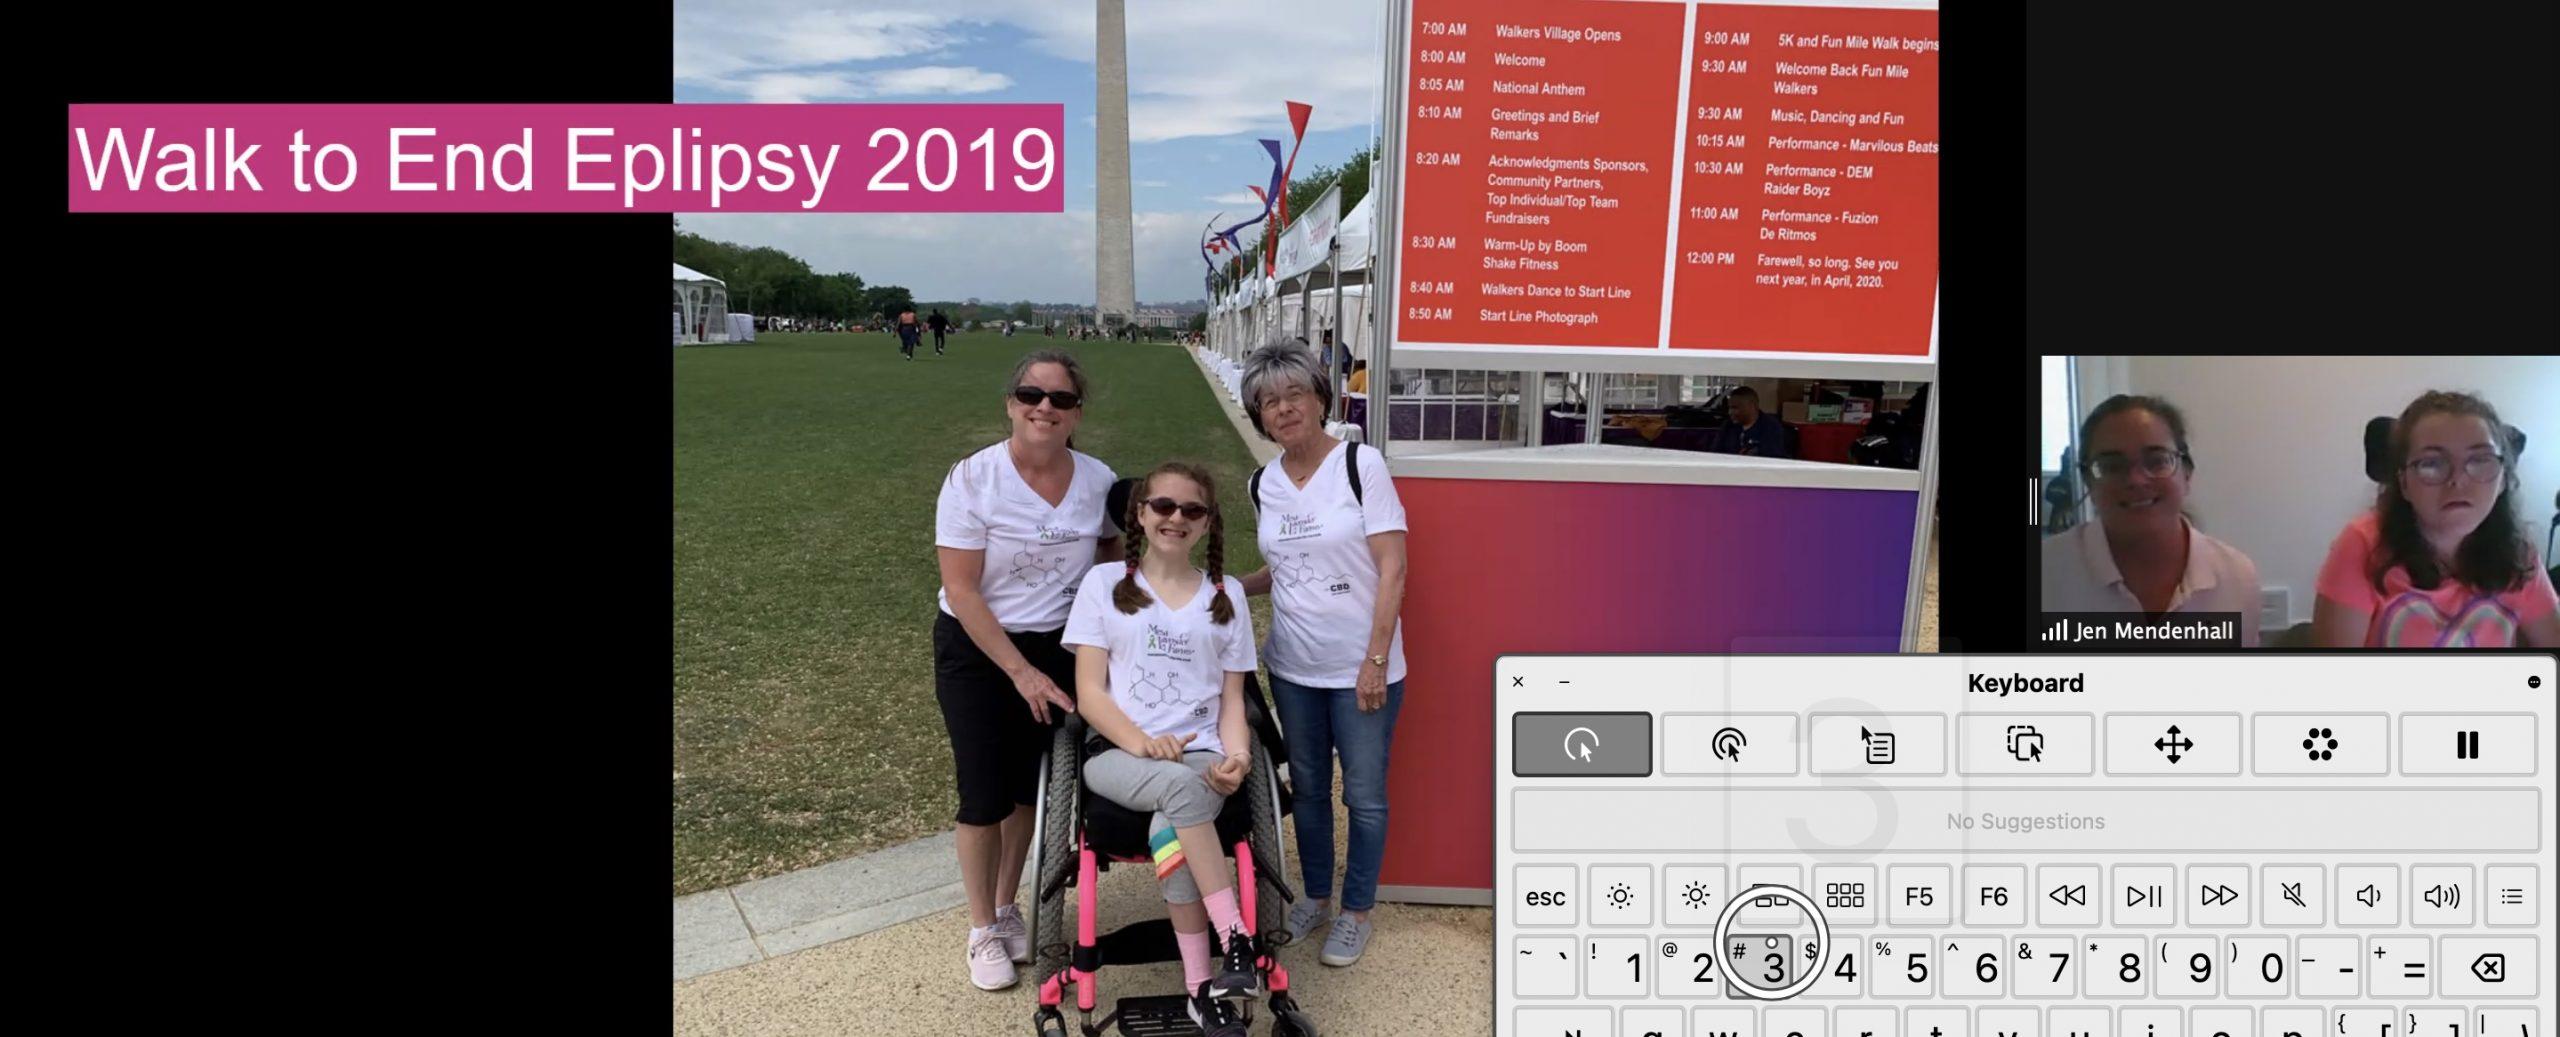 Walk to End Epilepsy photo